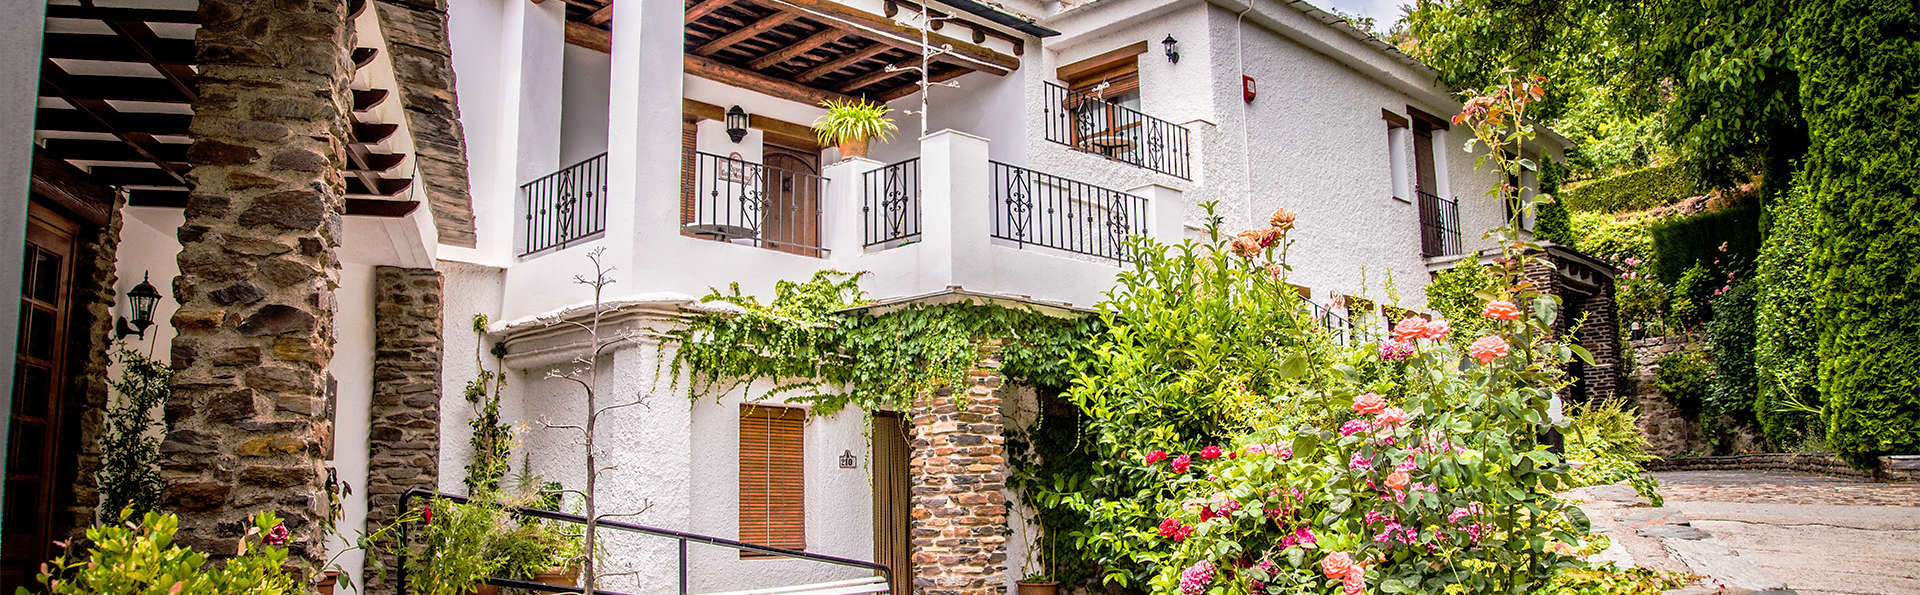 Hotel Rural Finca Los Llanos - EDIT_2_EXT.jpg